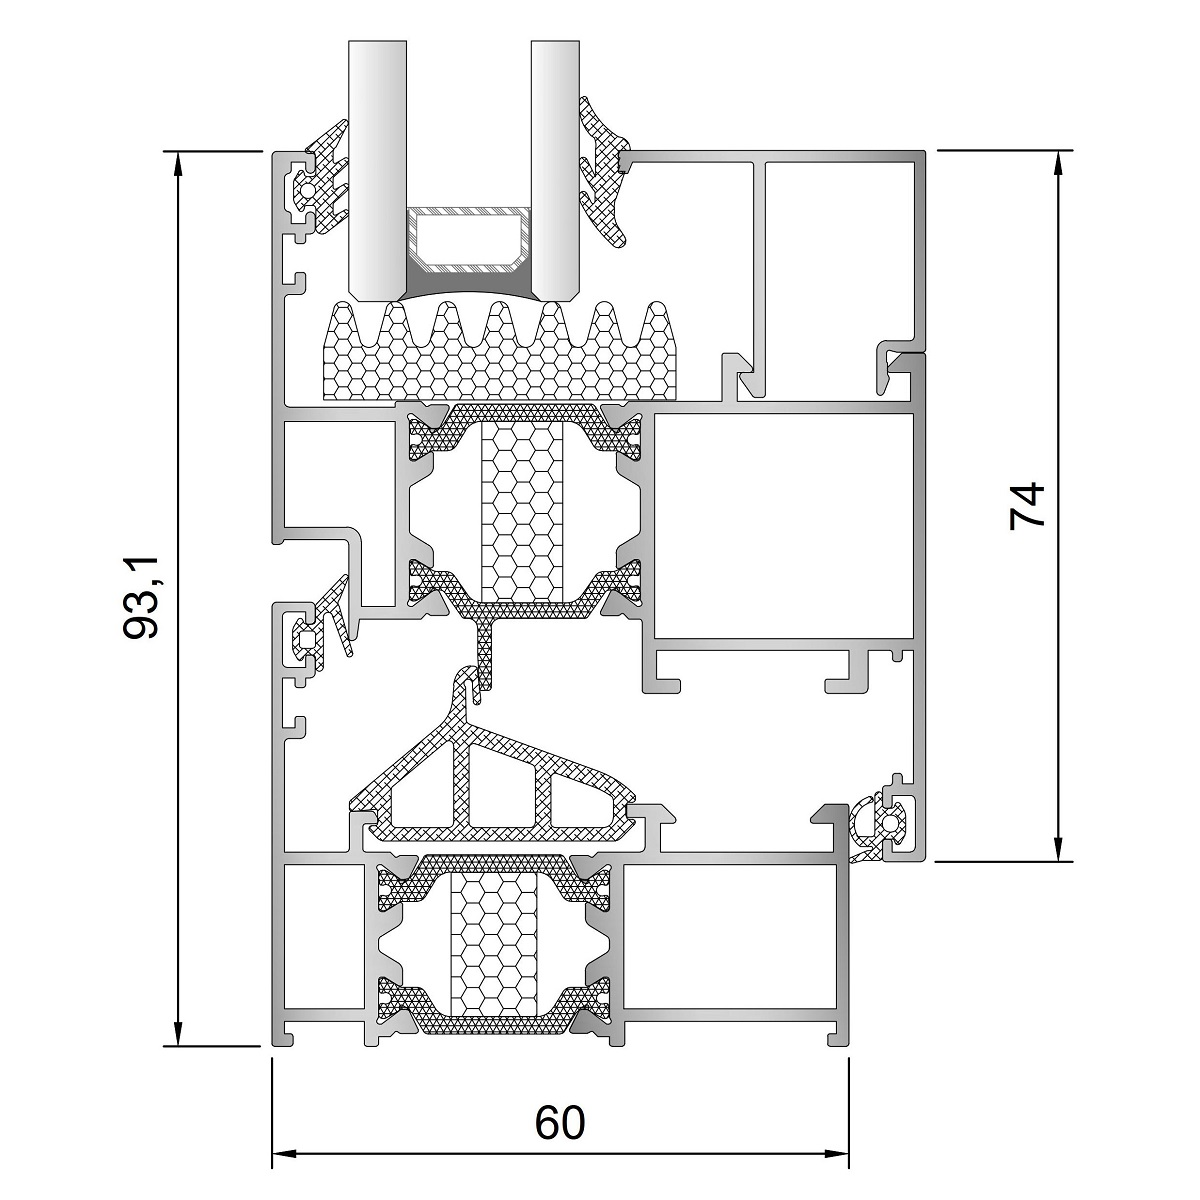 Inoform-F60-CE-section